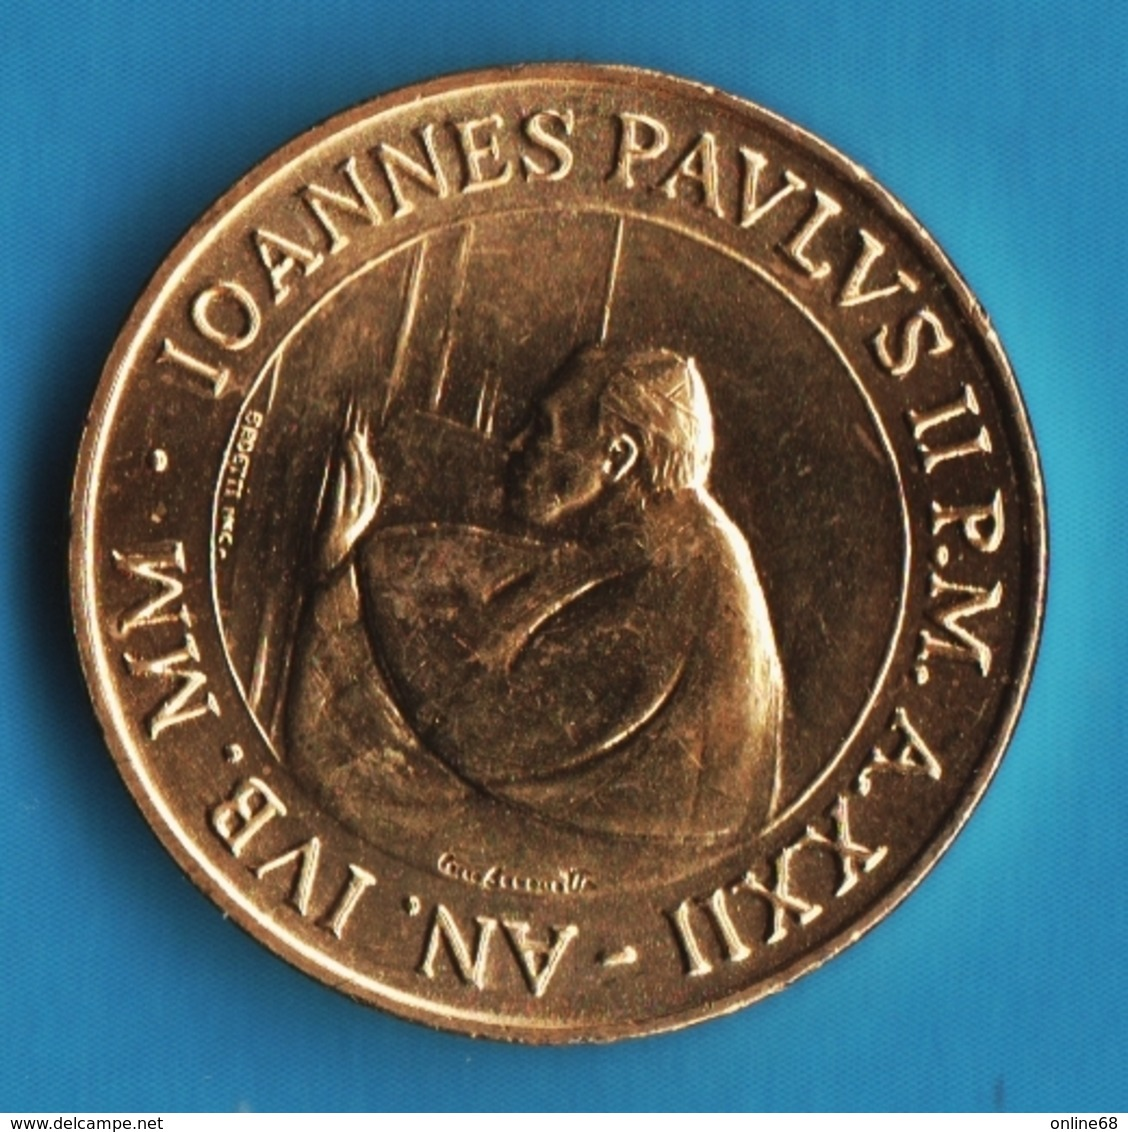 CITTA' DEL VATICANO 50 LIRE 2000  KM# 325 IOANNES PAVLVS II  An.XXII - Vaticano (Ciudad Del)